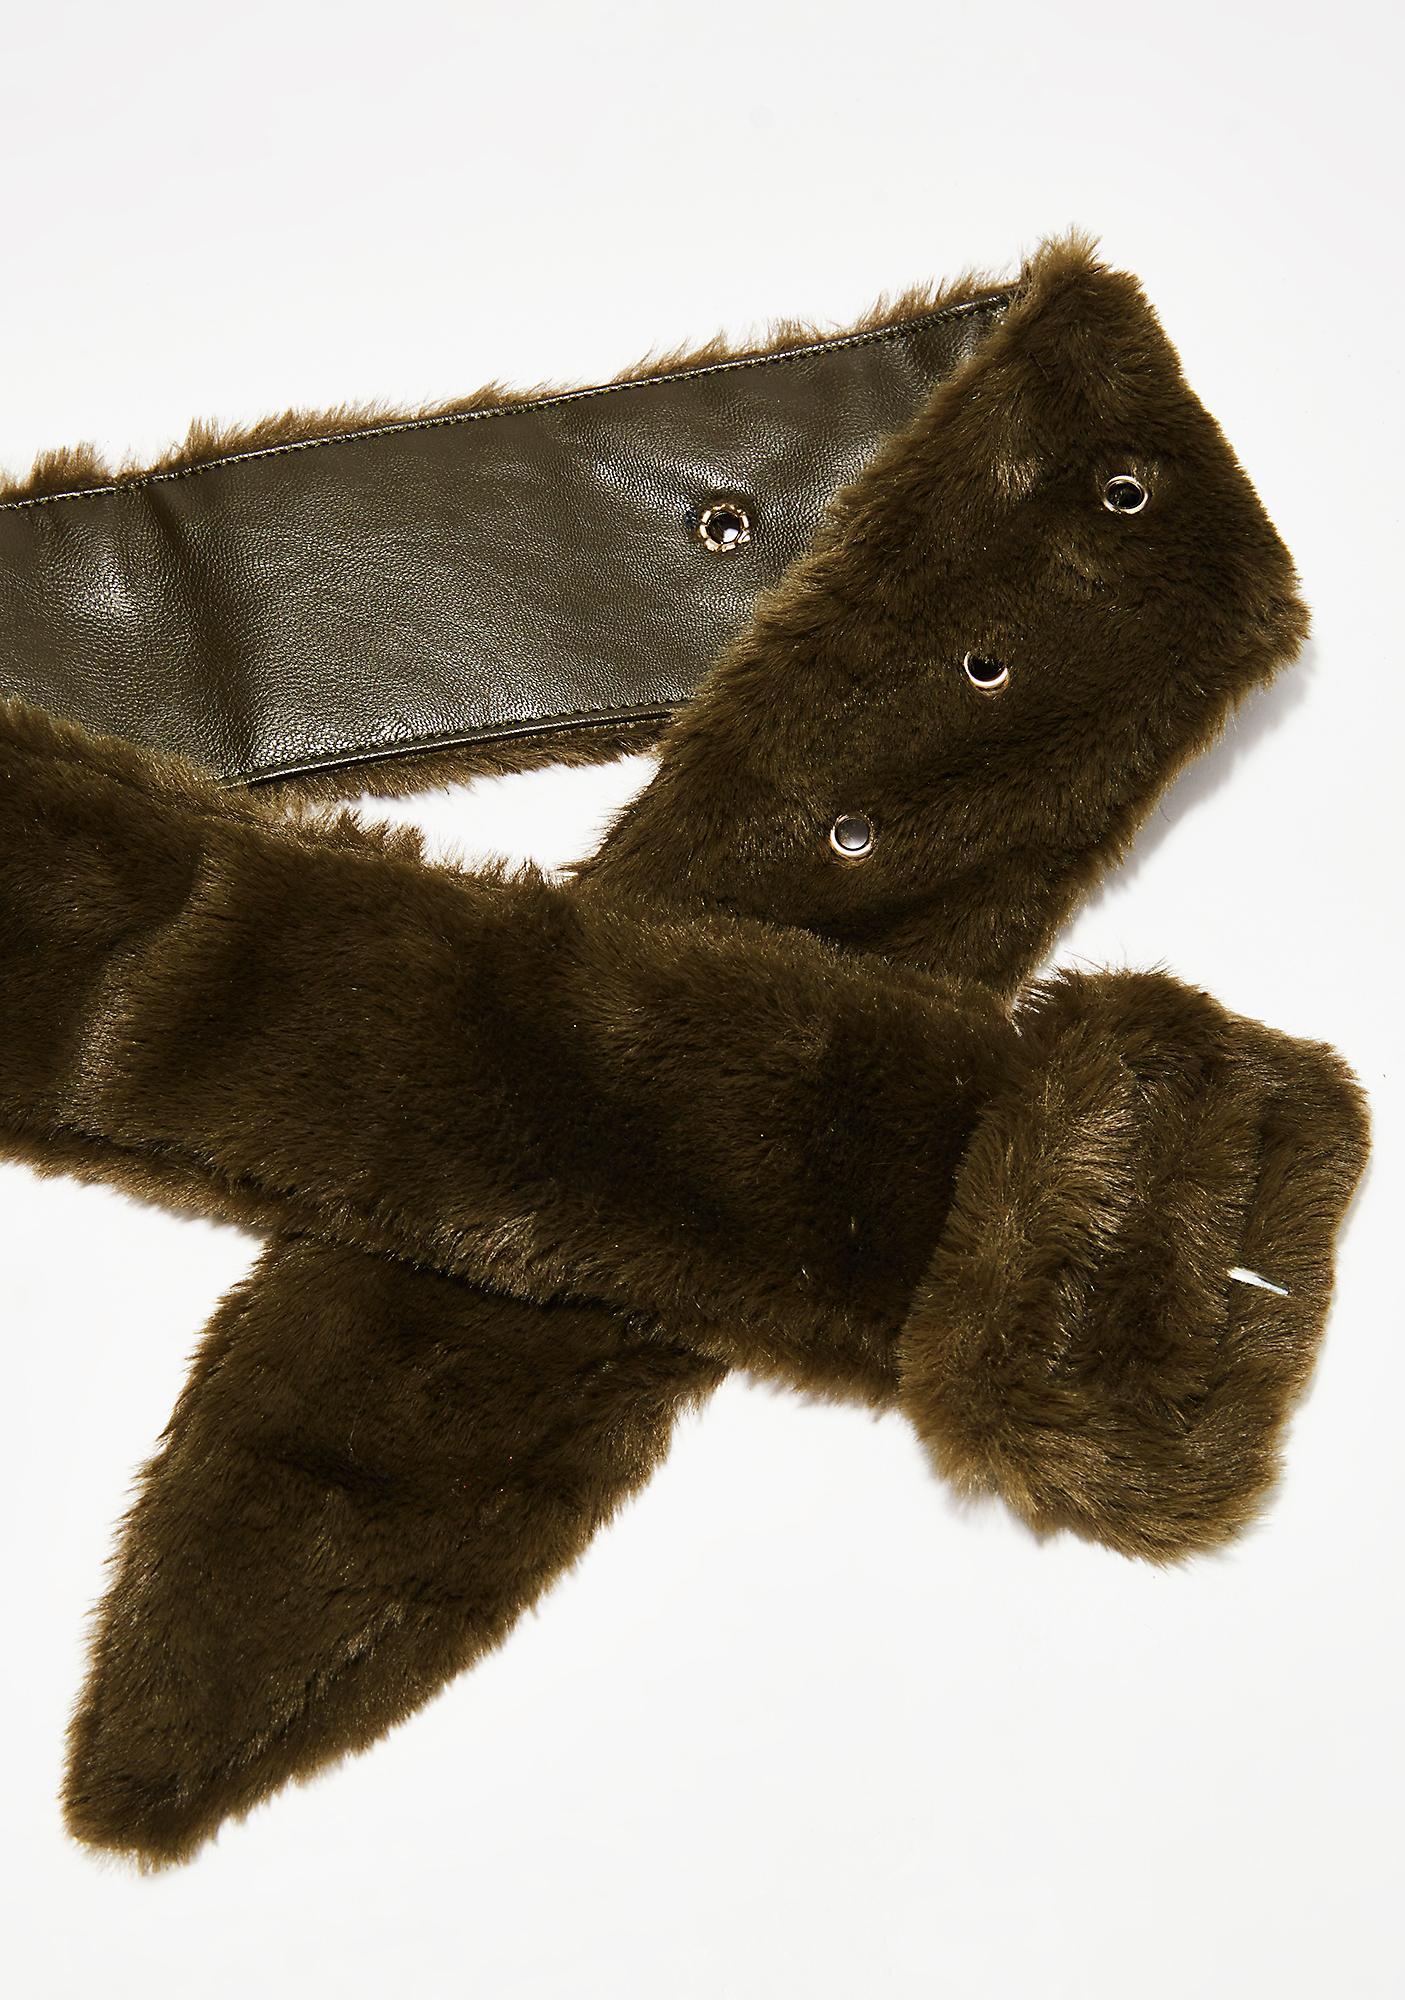 Olive Embrace This Fuzz Belt